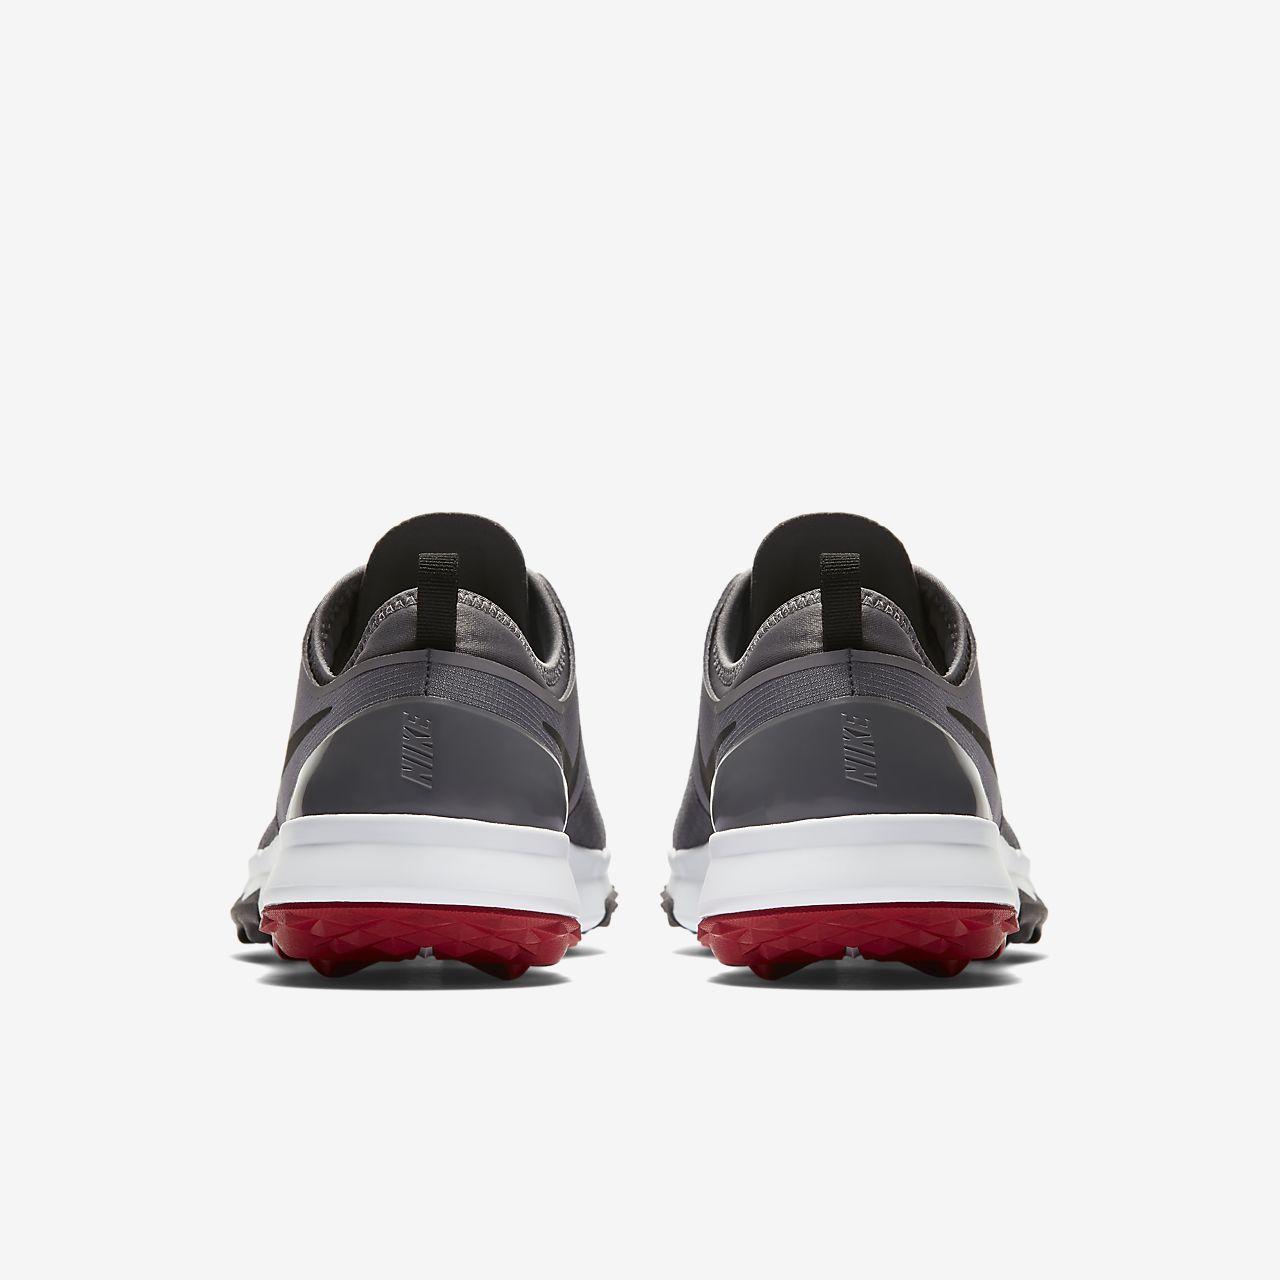 88459f28f5bf6 Nike FI Impact 3 Zapatillas de golf - Hombre. Nike.com ES